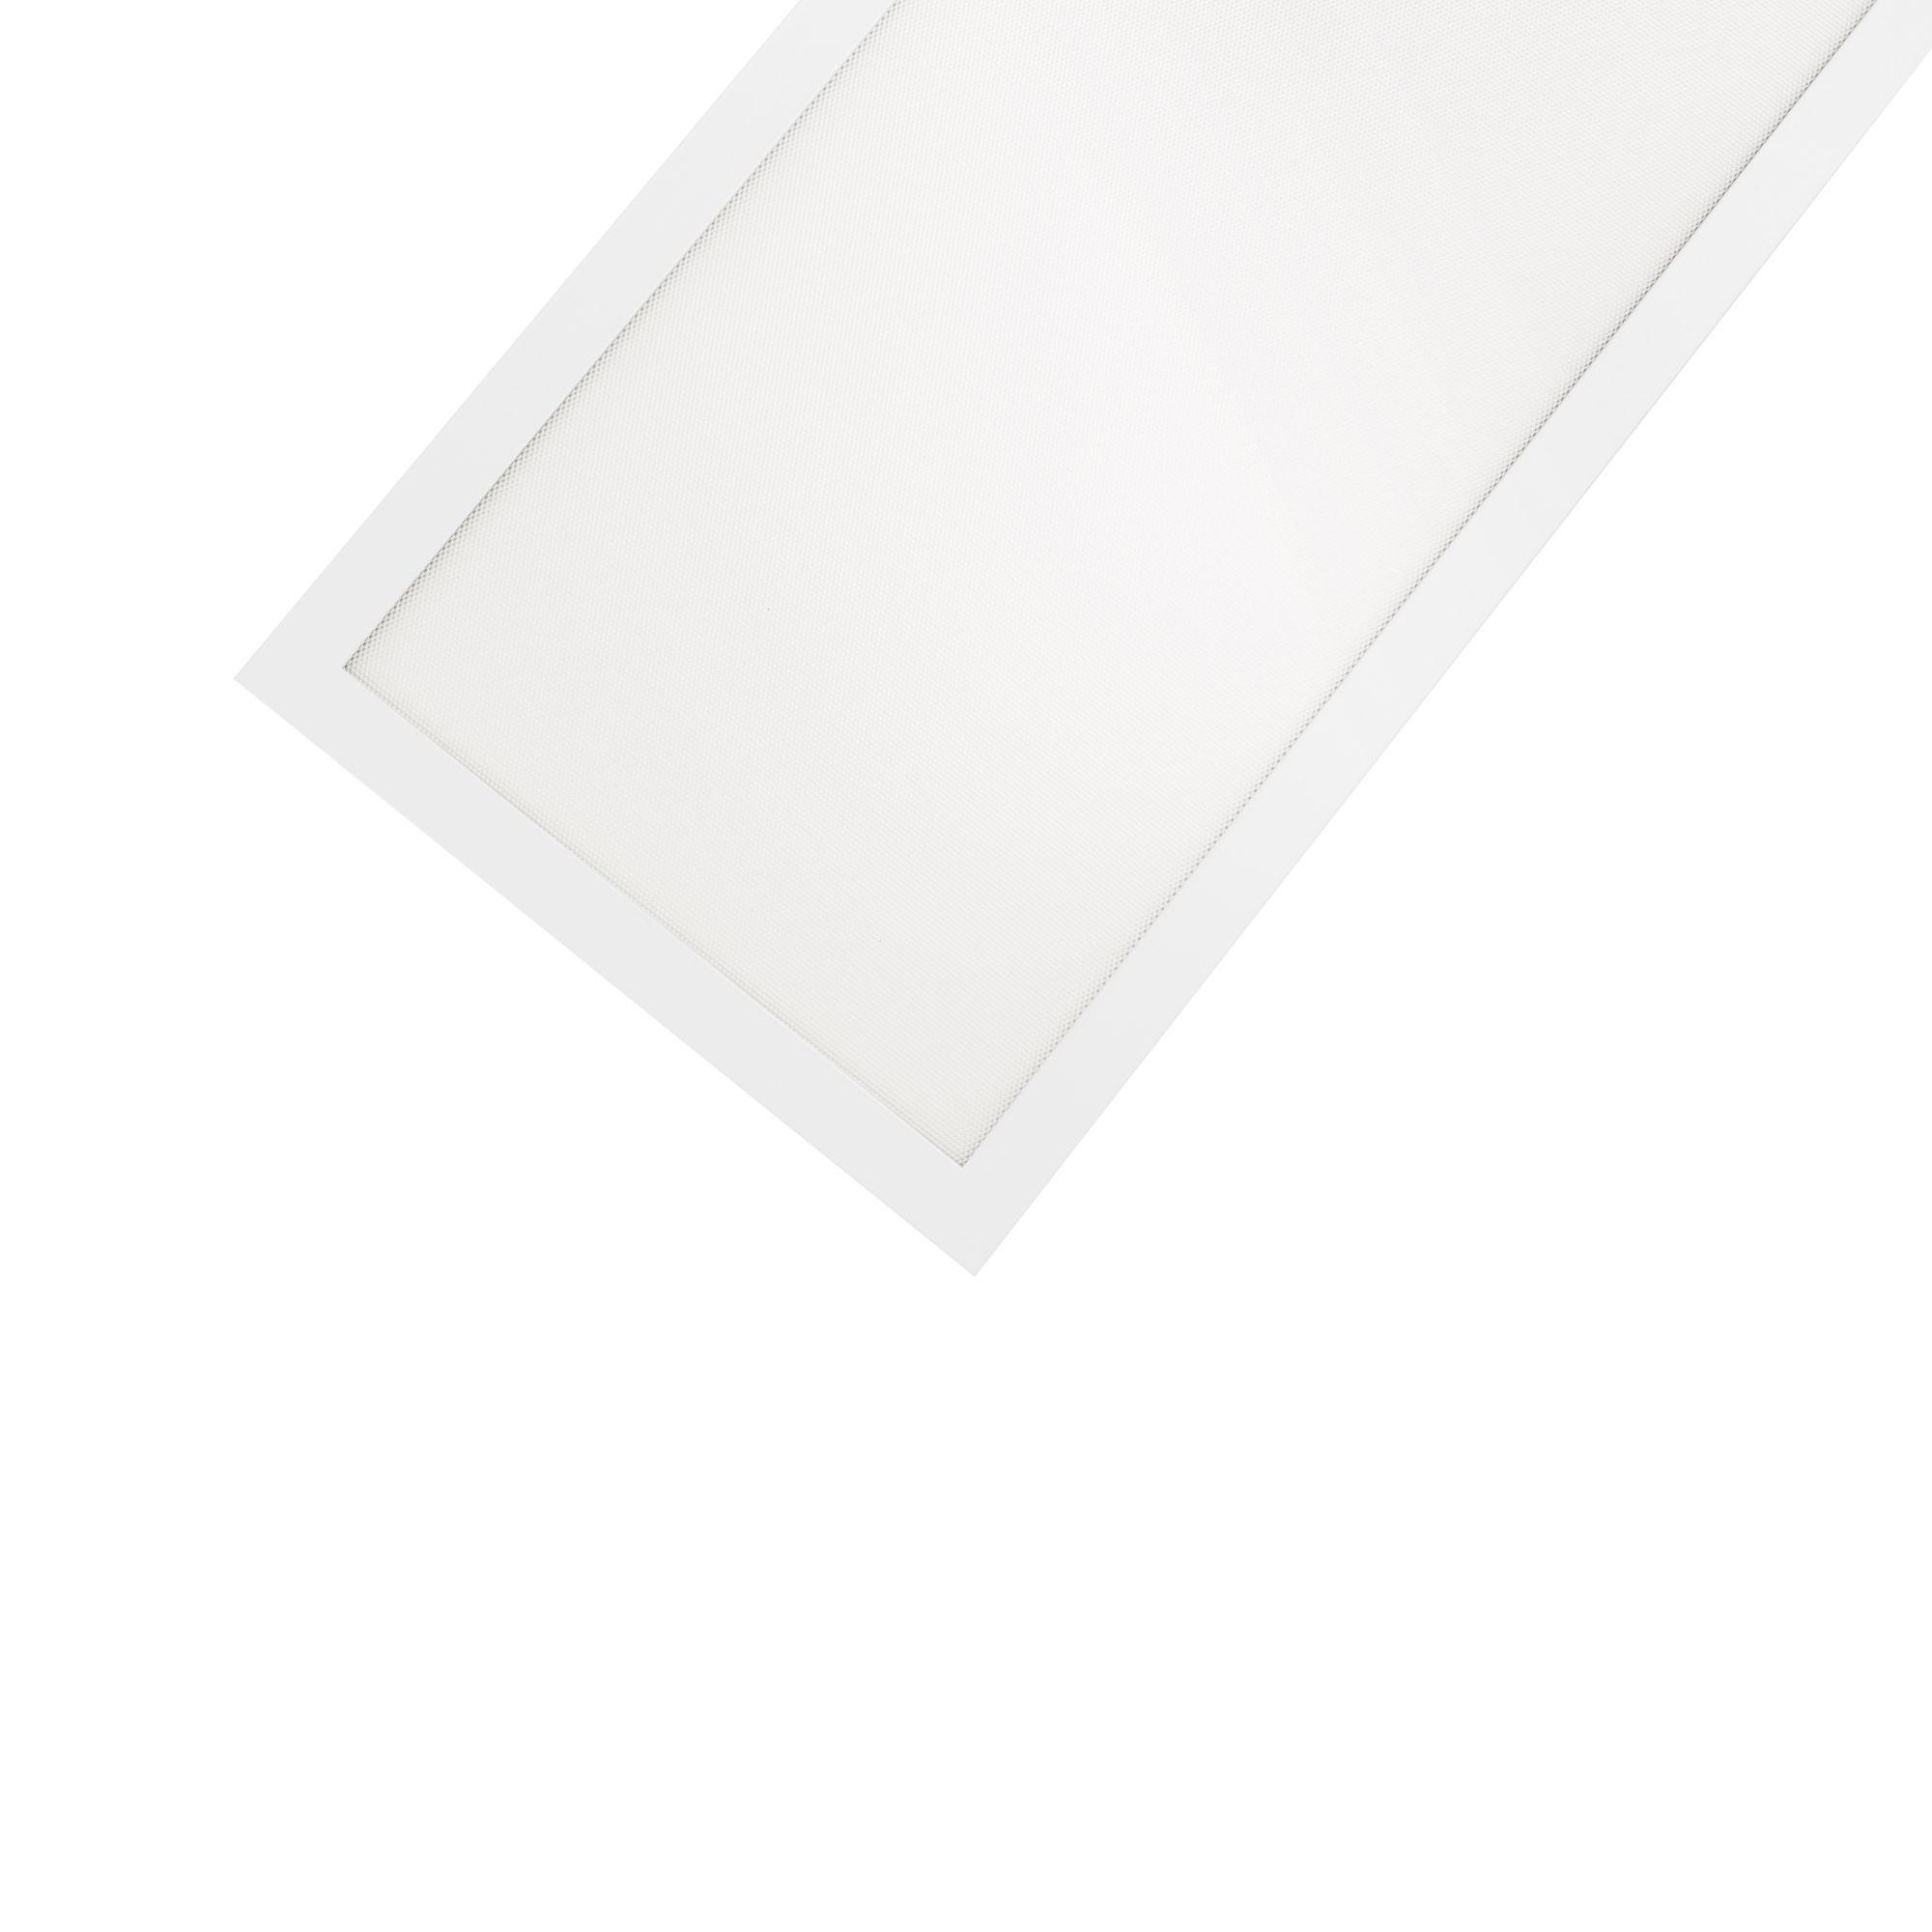 CYANOSIS LED LIGHT PANEL - 36W - 1200mm X 300mm - 4000K